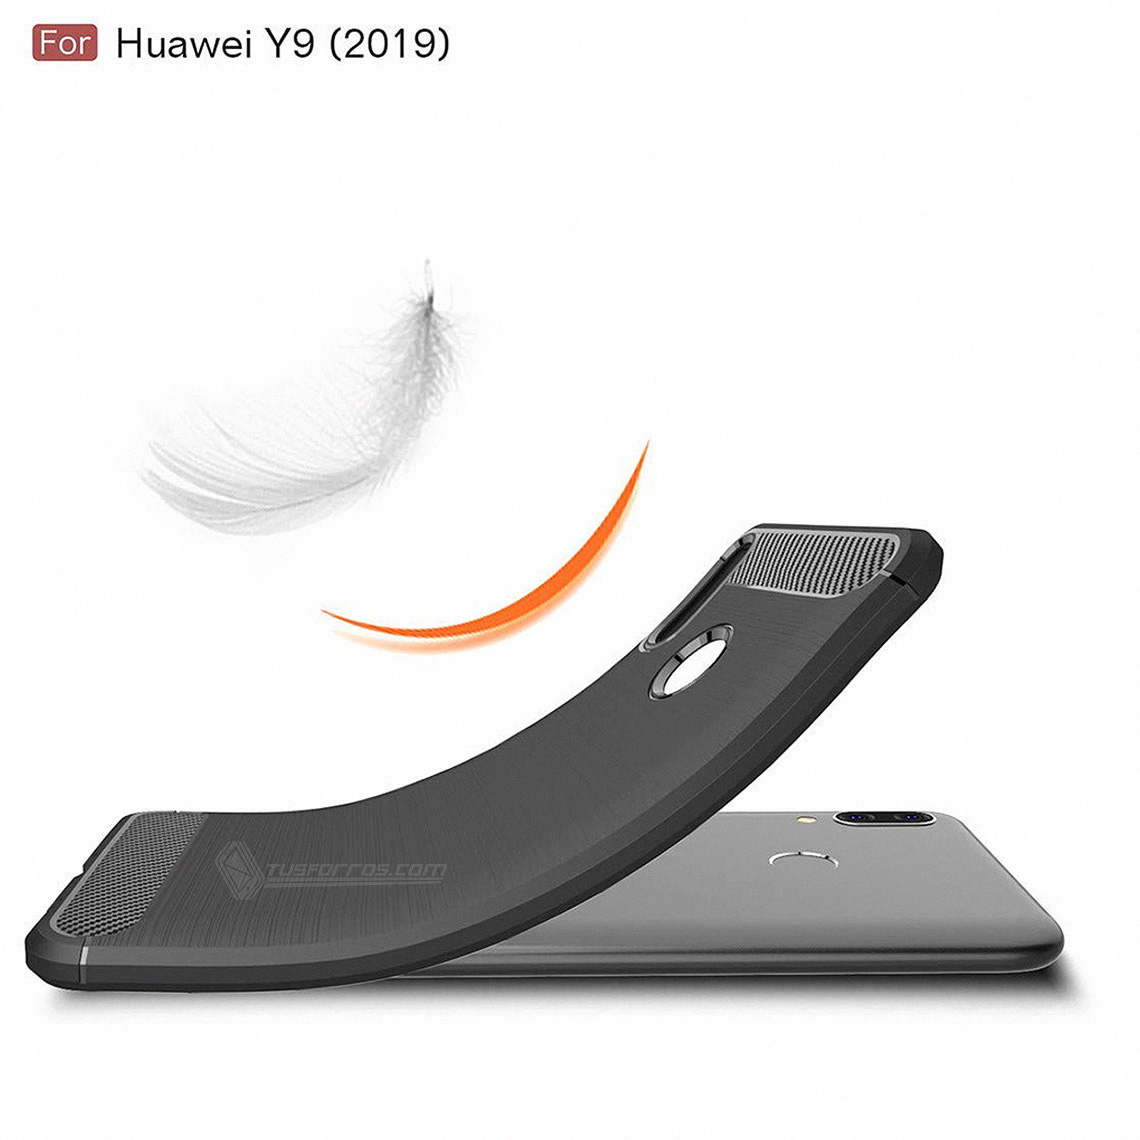 Huawei Y9 2019 Forro Fibra de Carbono Anti-Shock